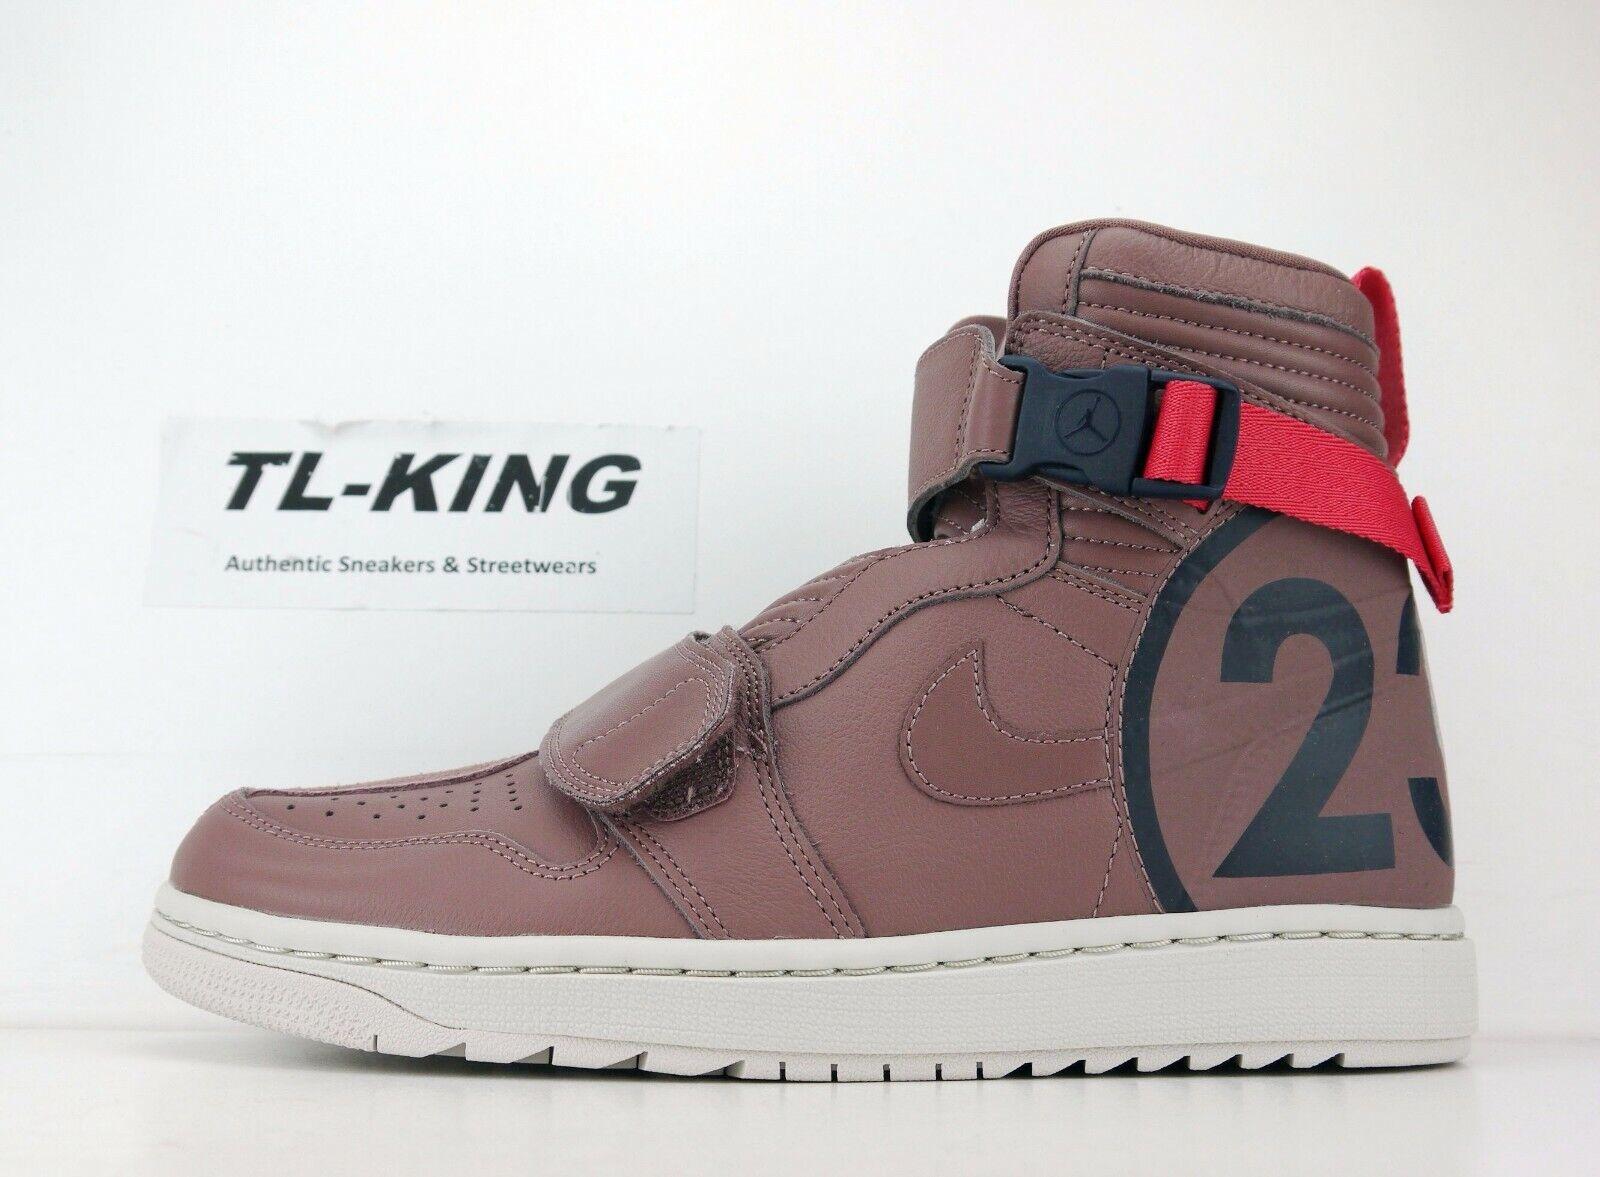 Nike SF Air Force 1 High Nike air force 1 high AA1128 204 men sneakers running shoes